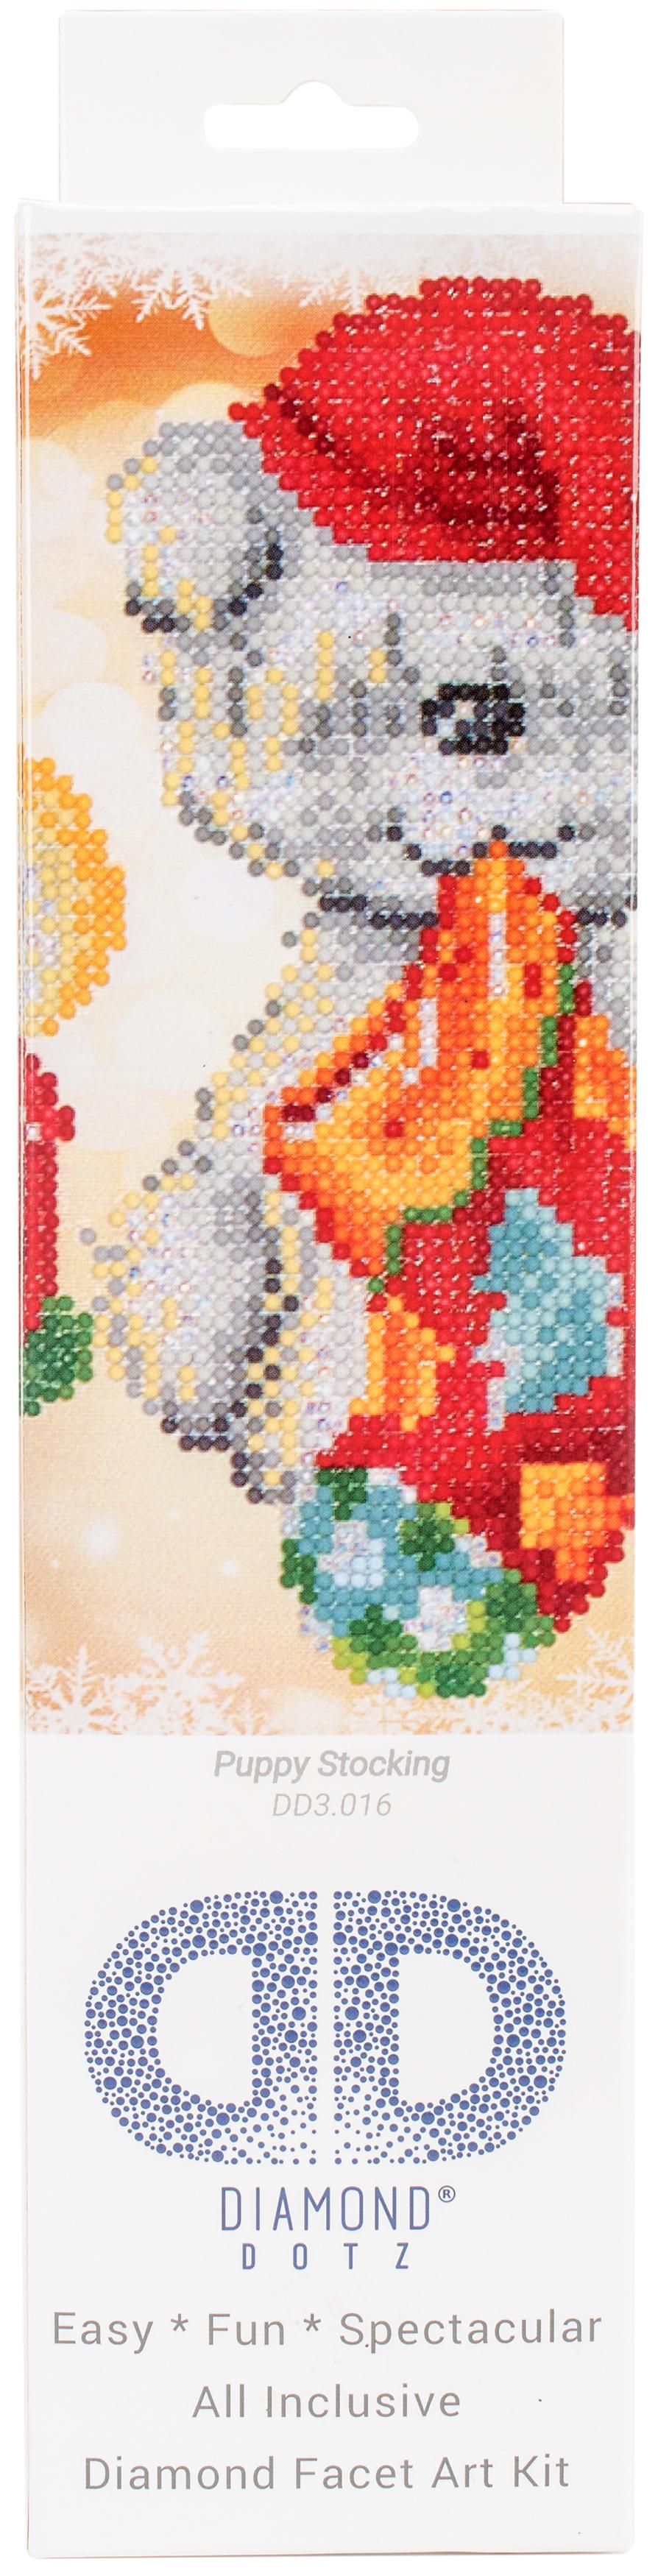 Diamond Dotz Diamond Embroidery Facet Art Kit 11X11.75-Puppy Stocking